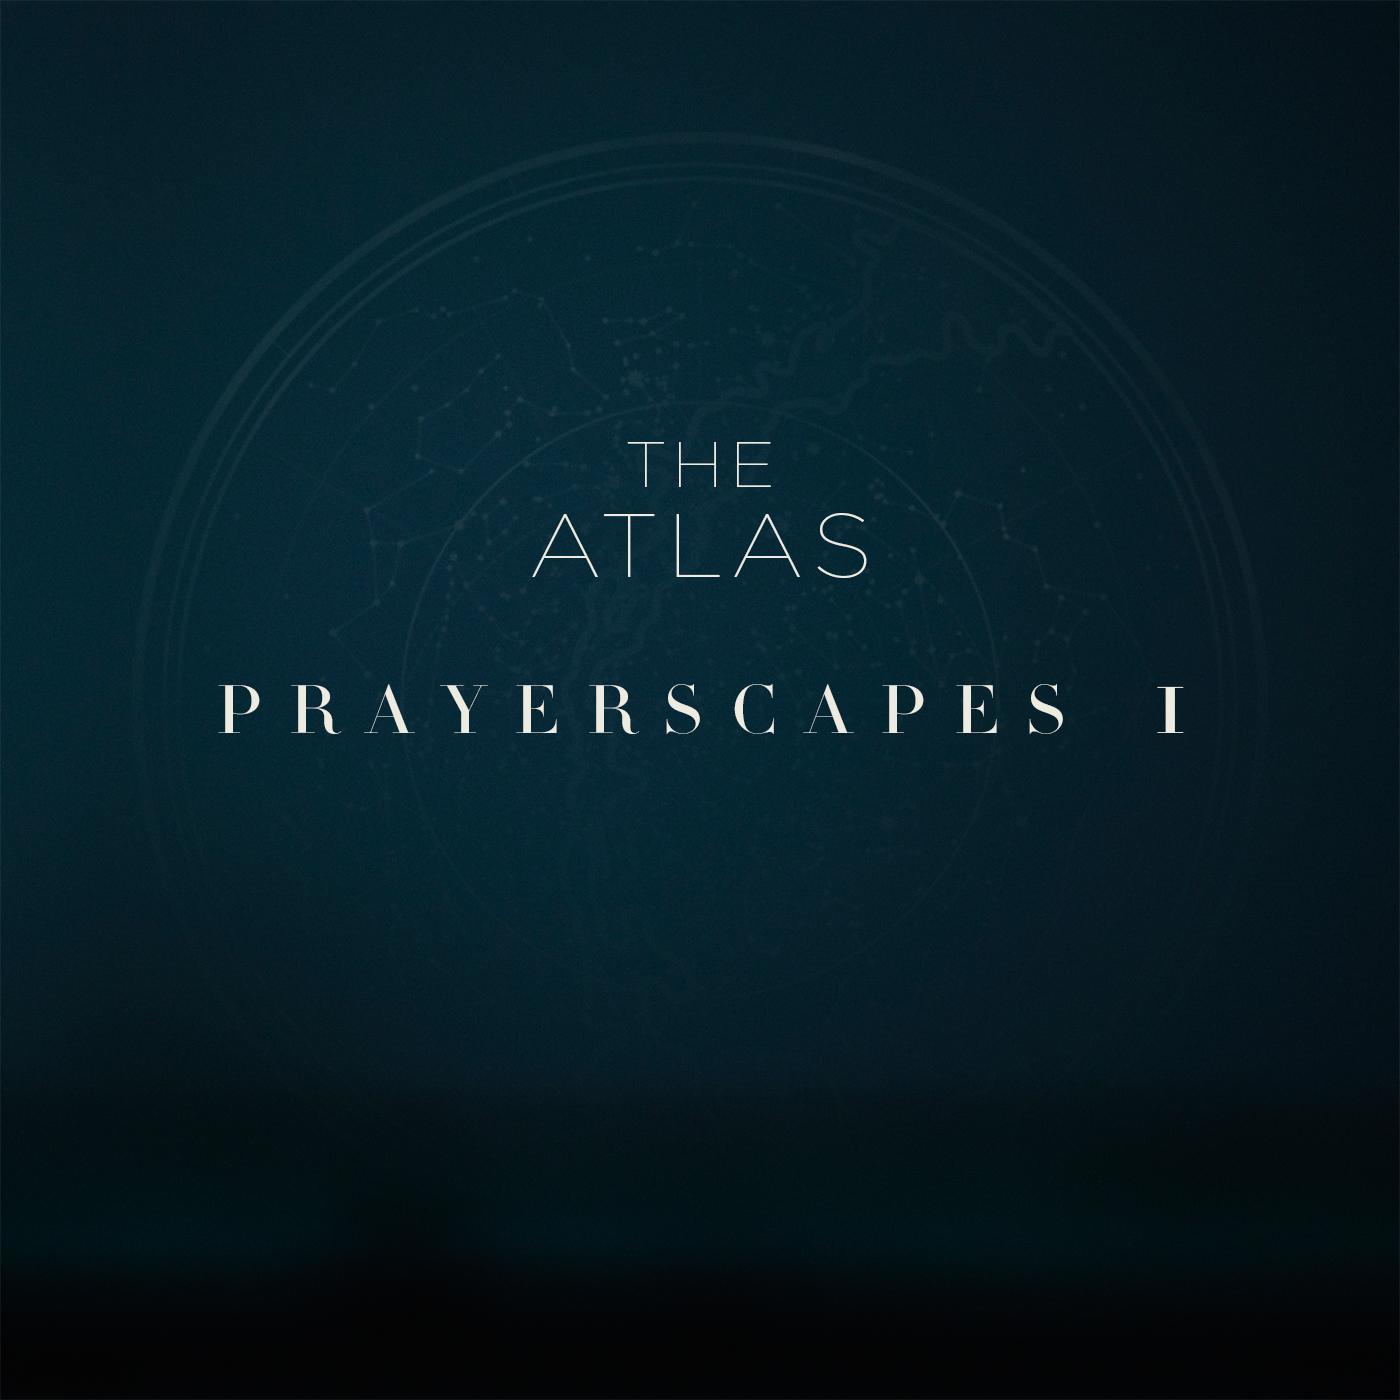 the_atlas_prayerscapes.jpg